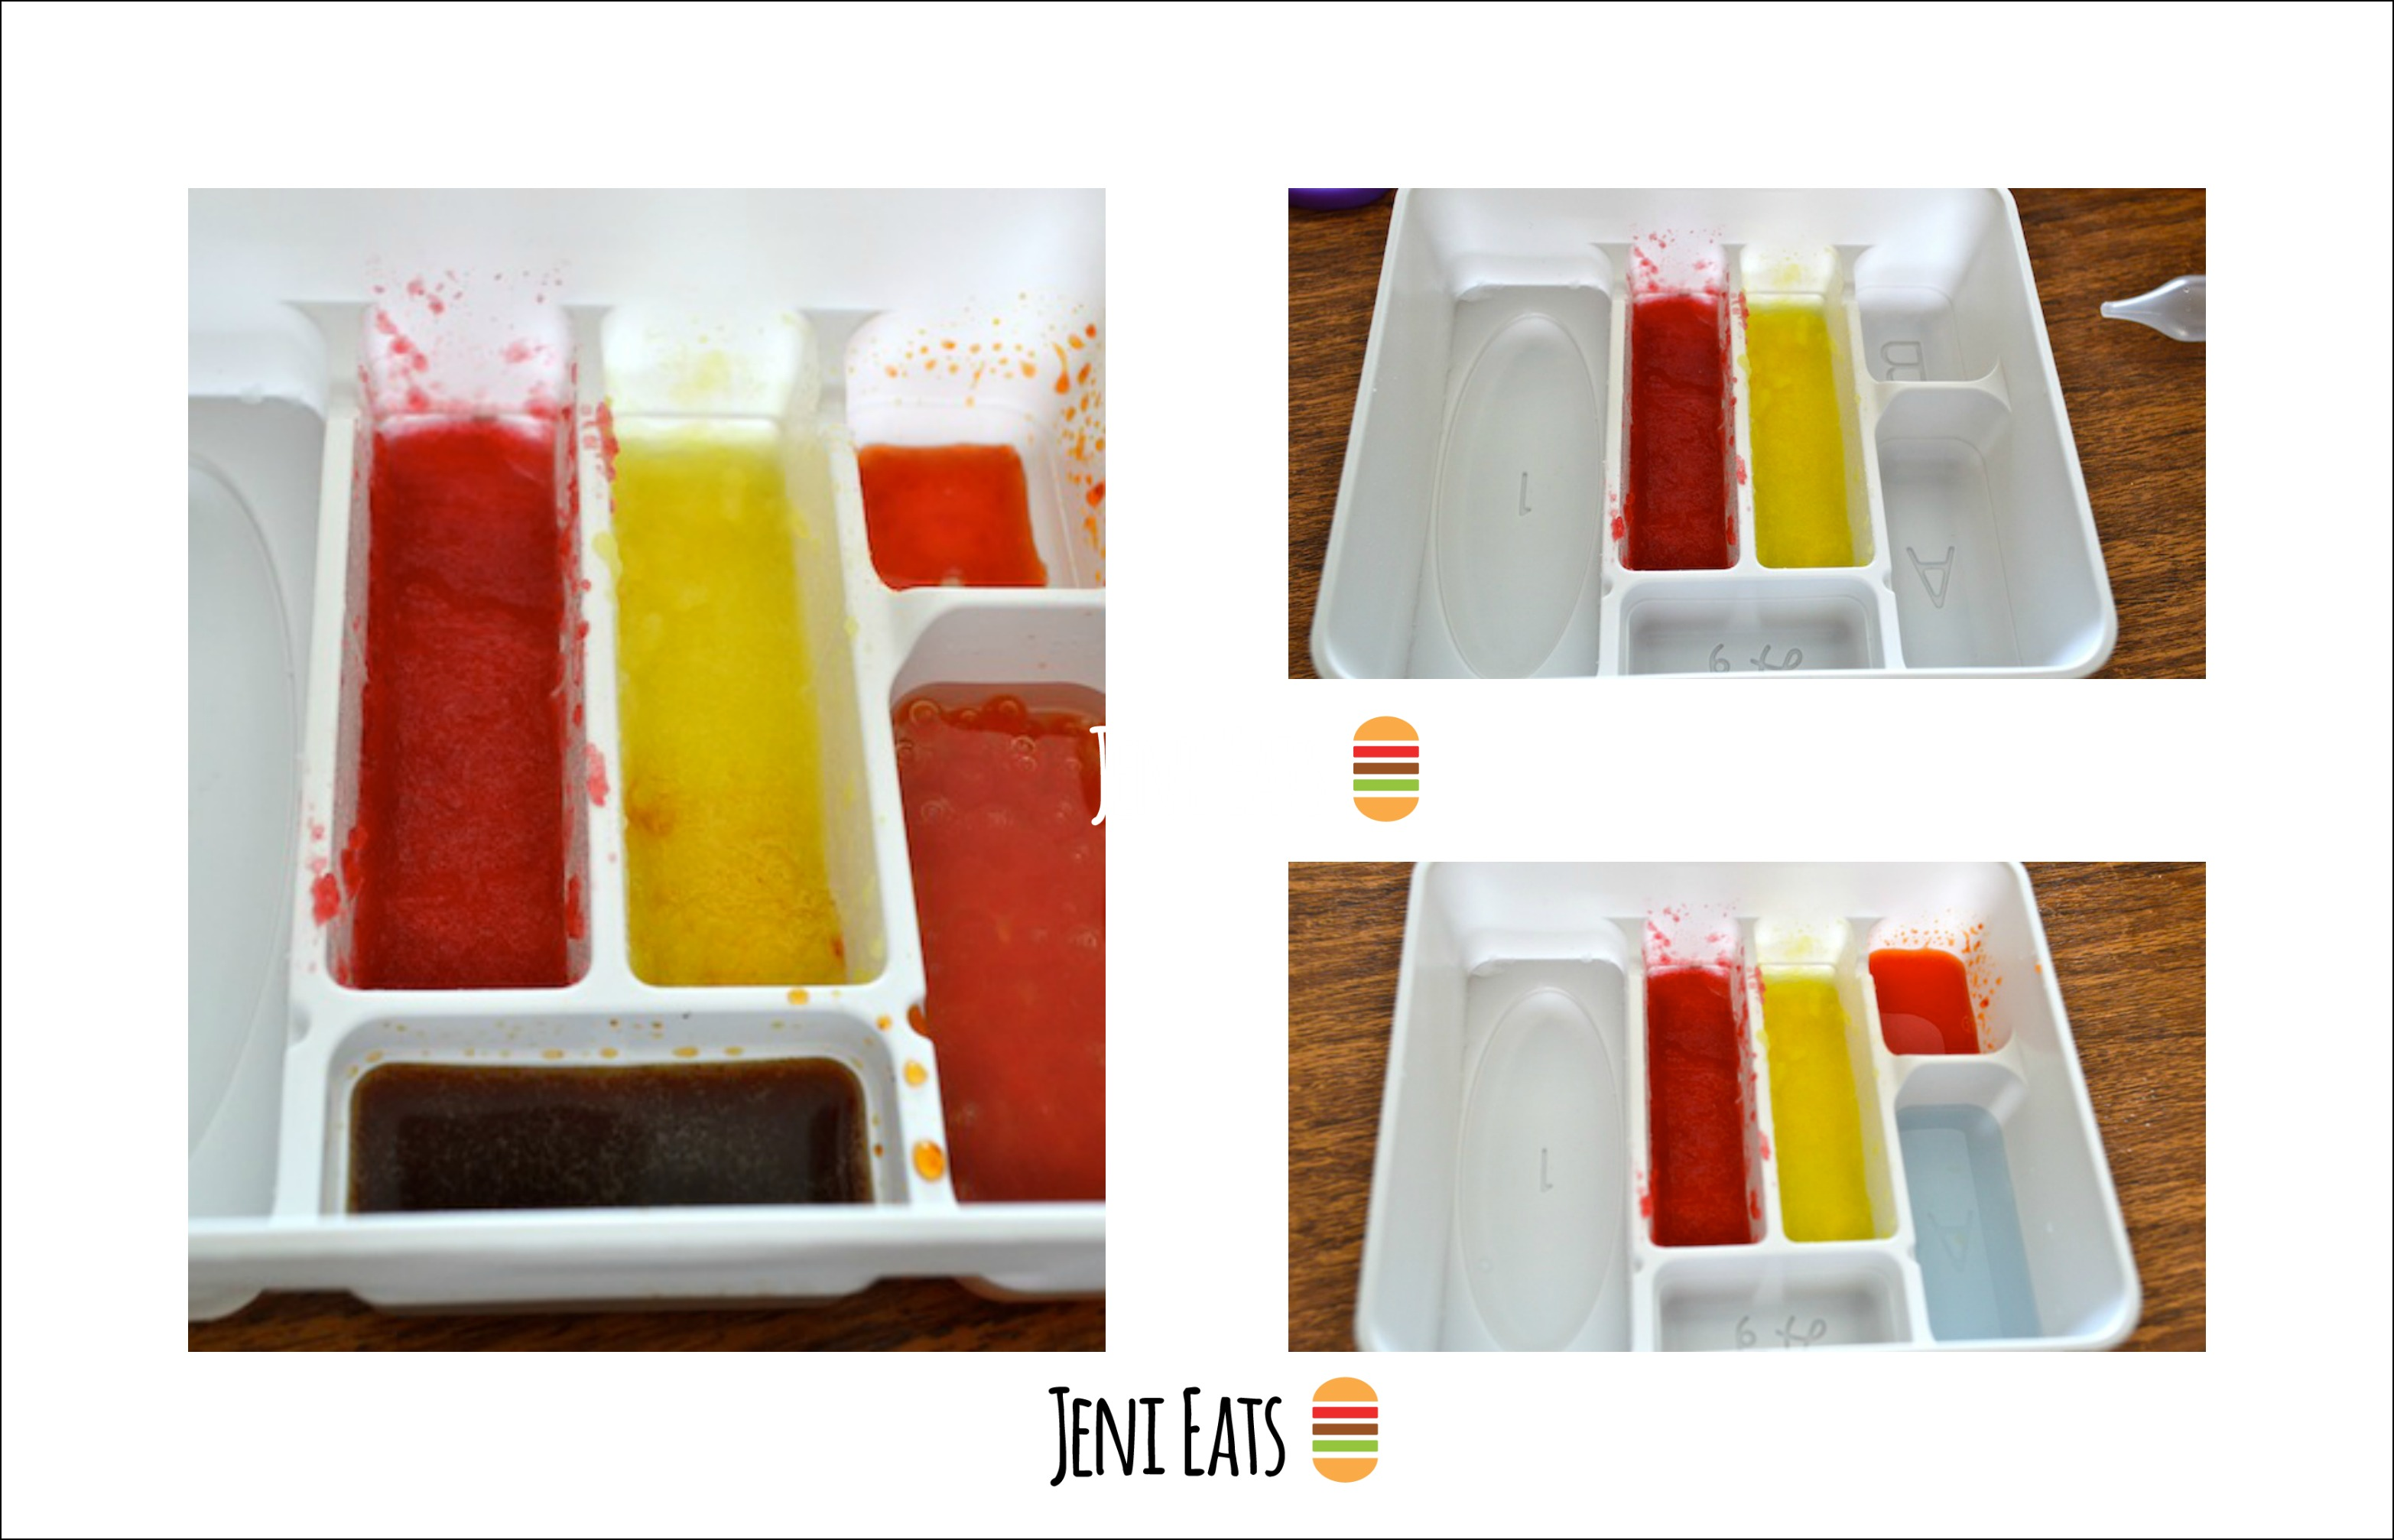 Asian Grocery Archives - Jeni Eats